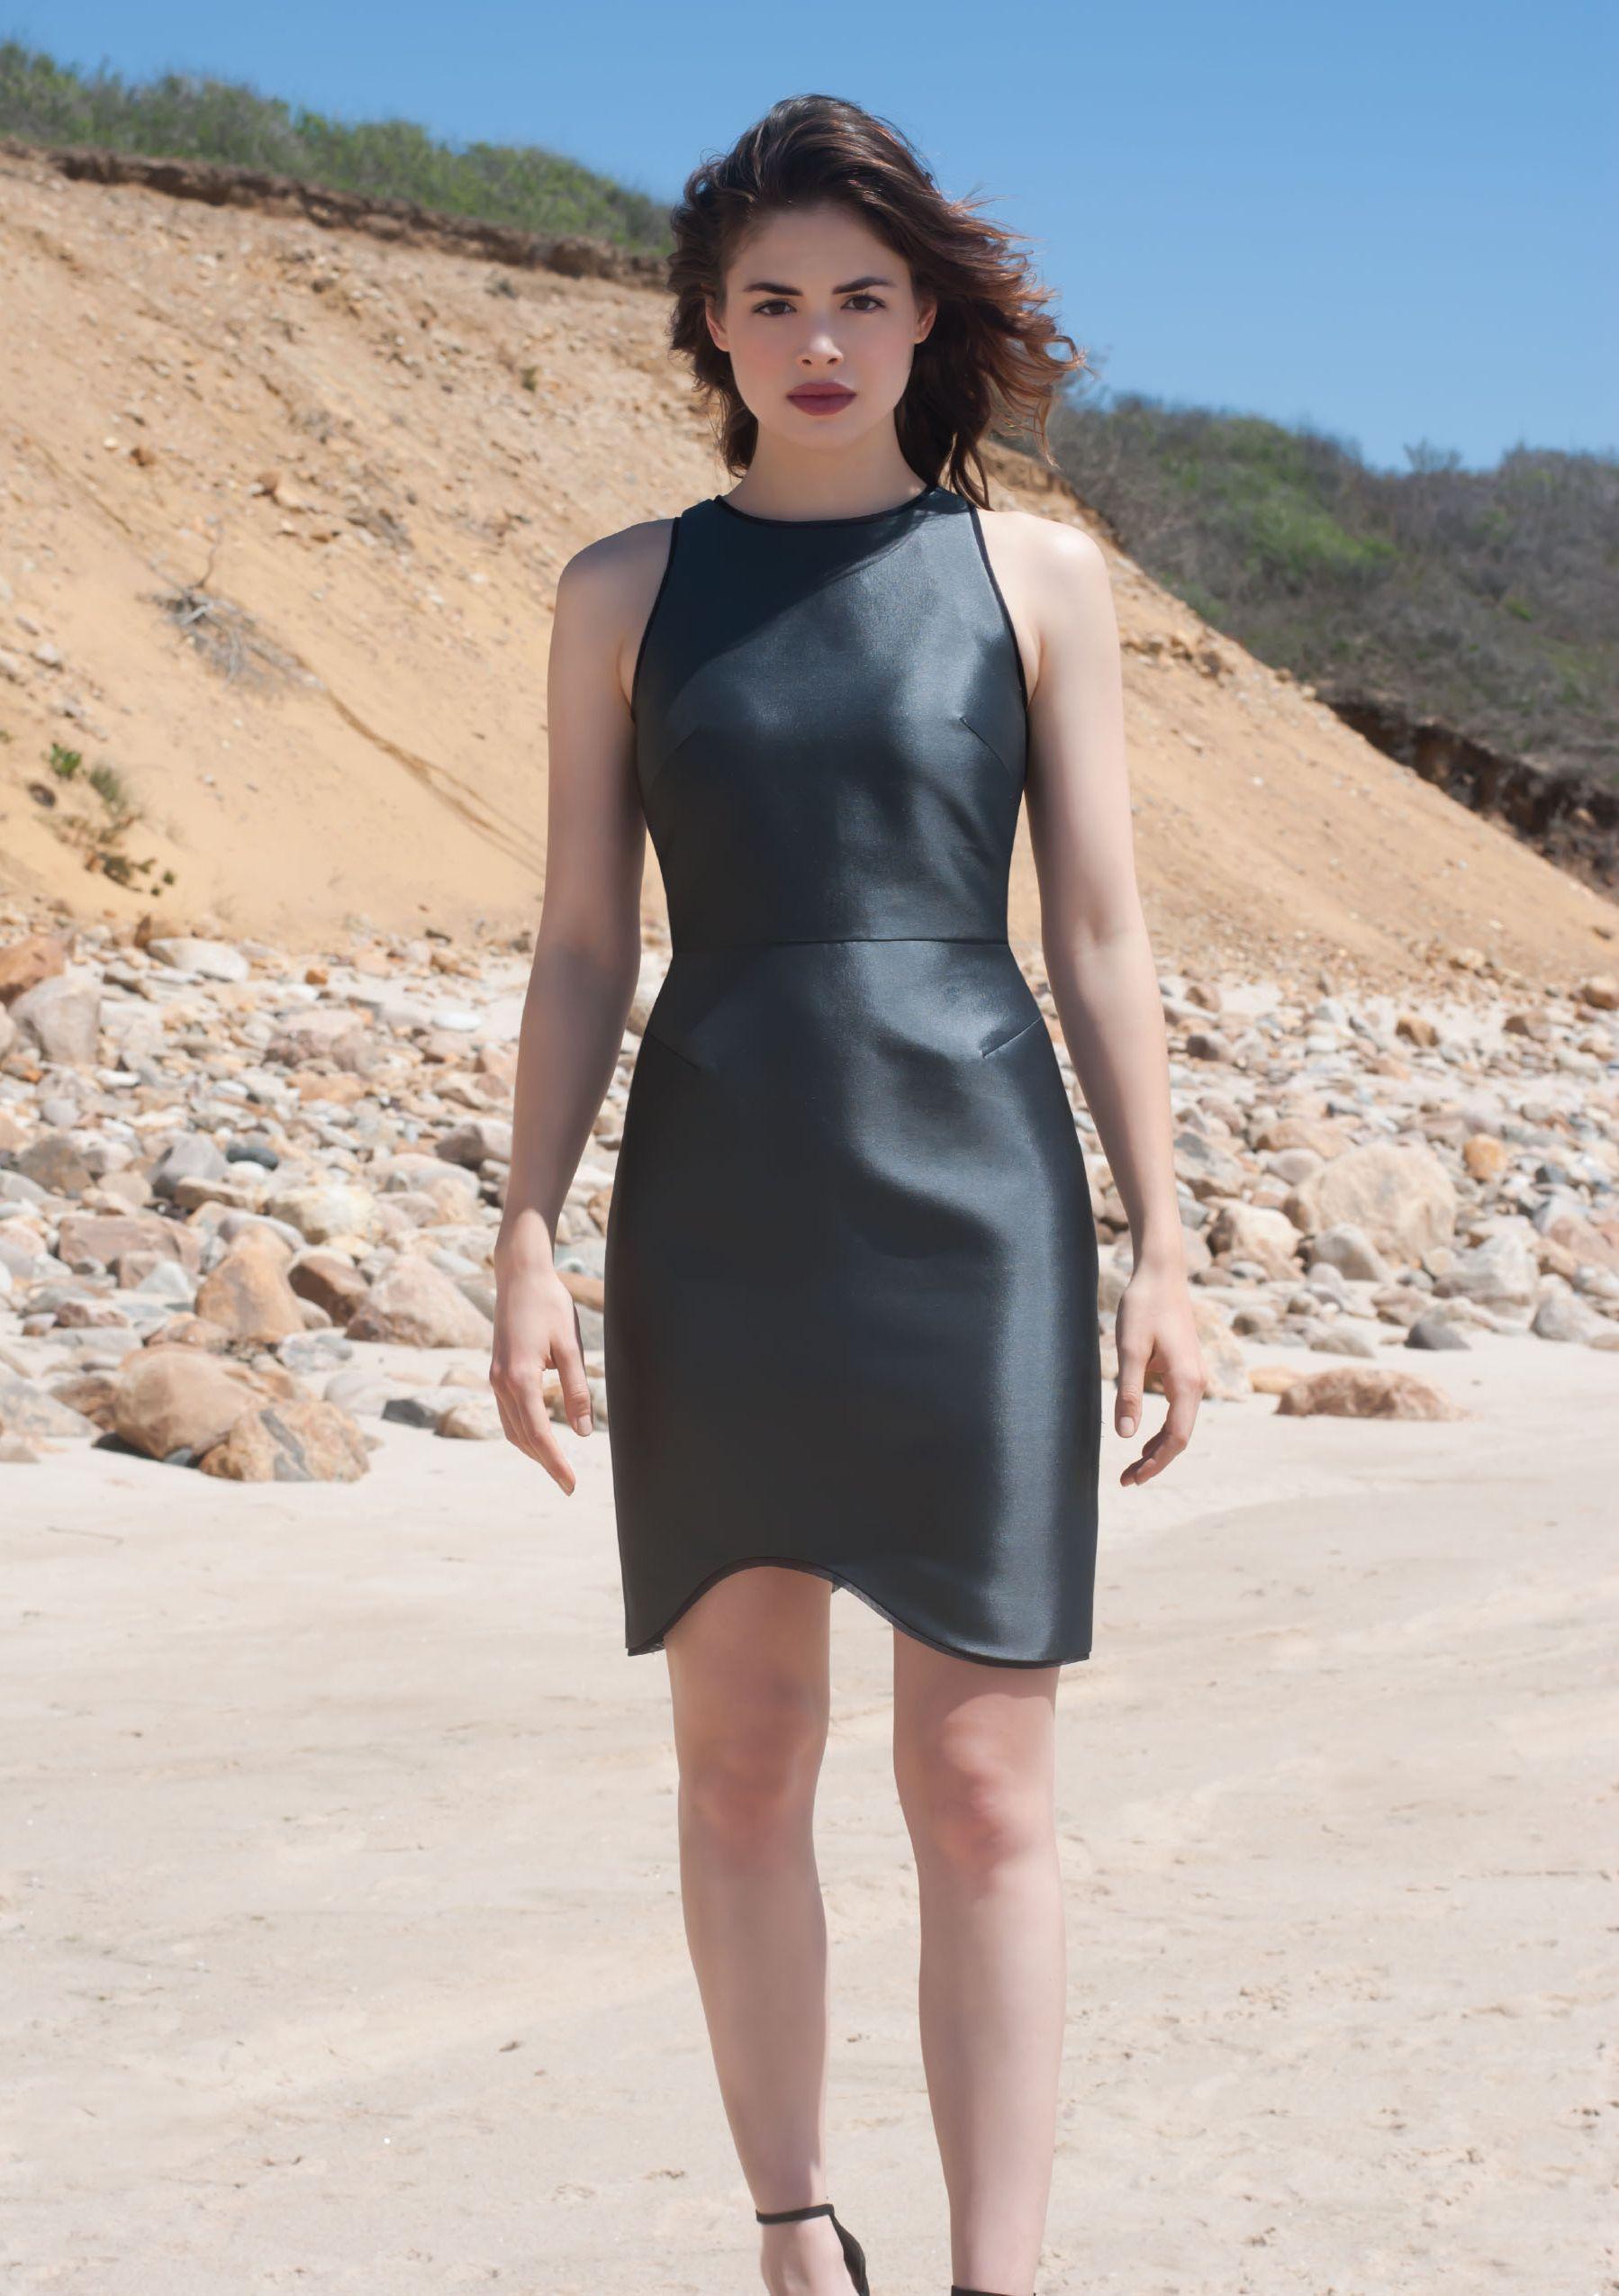 Http www health4supplement com keto bhb 800 reviews Erotic pic Rachel McAdams Naked Picture Scandal,Elena berkova leaked